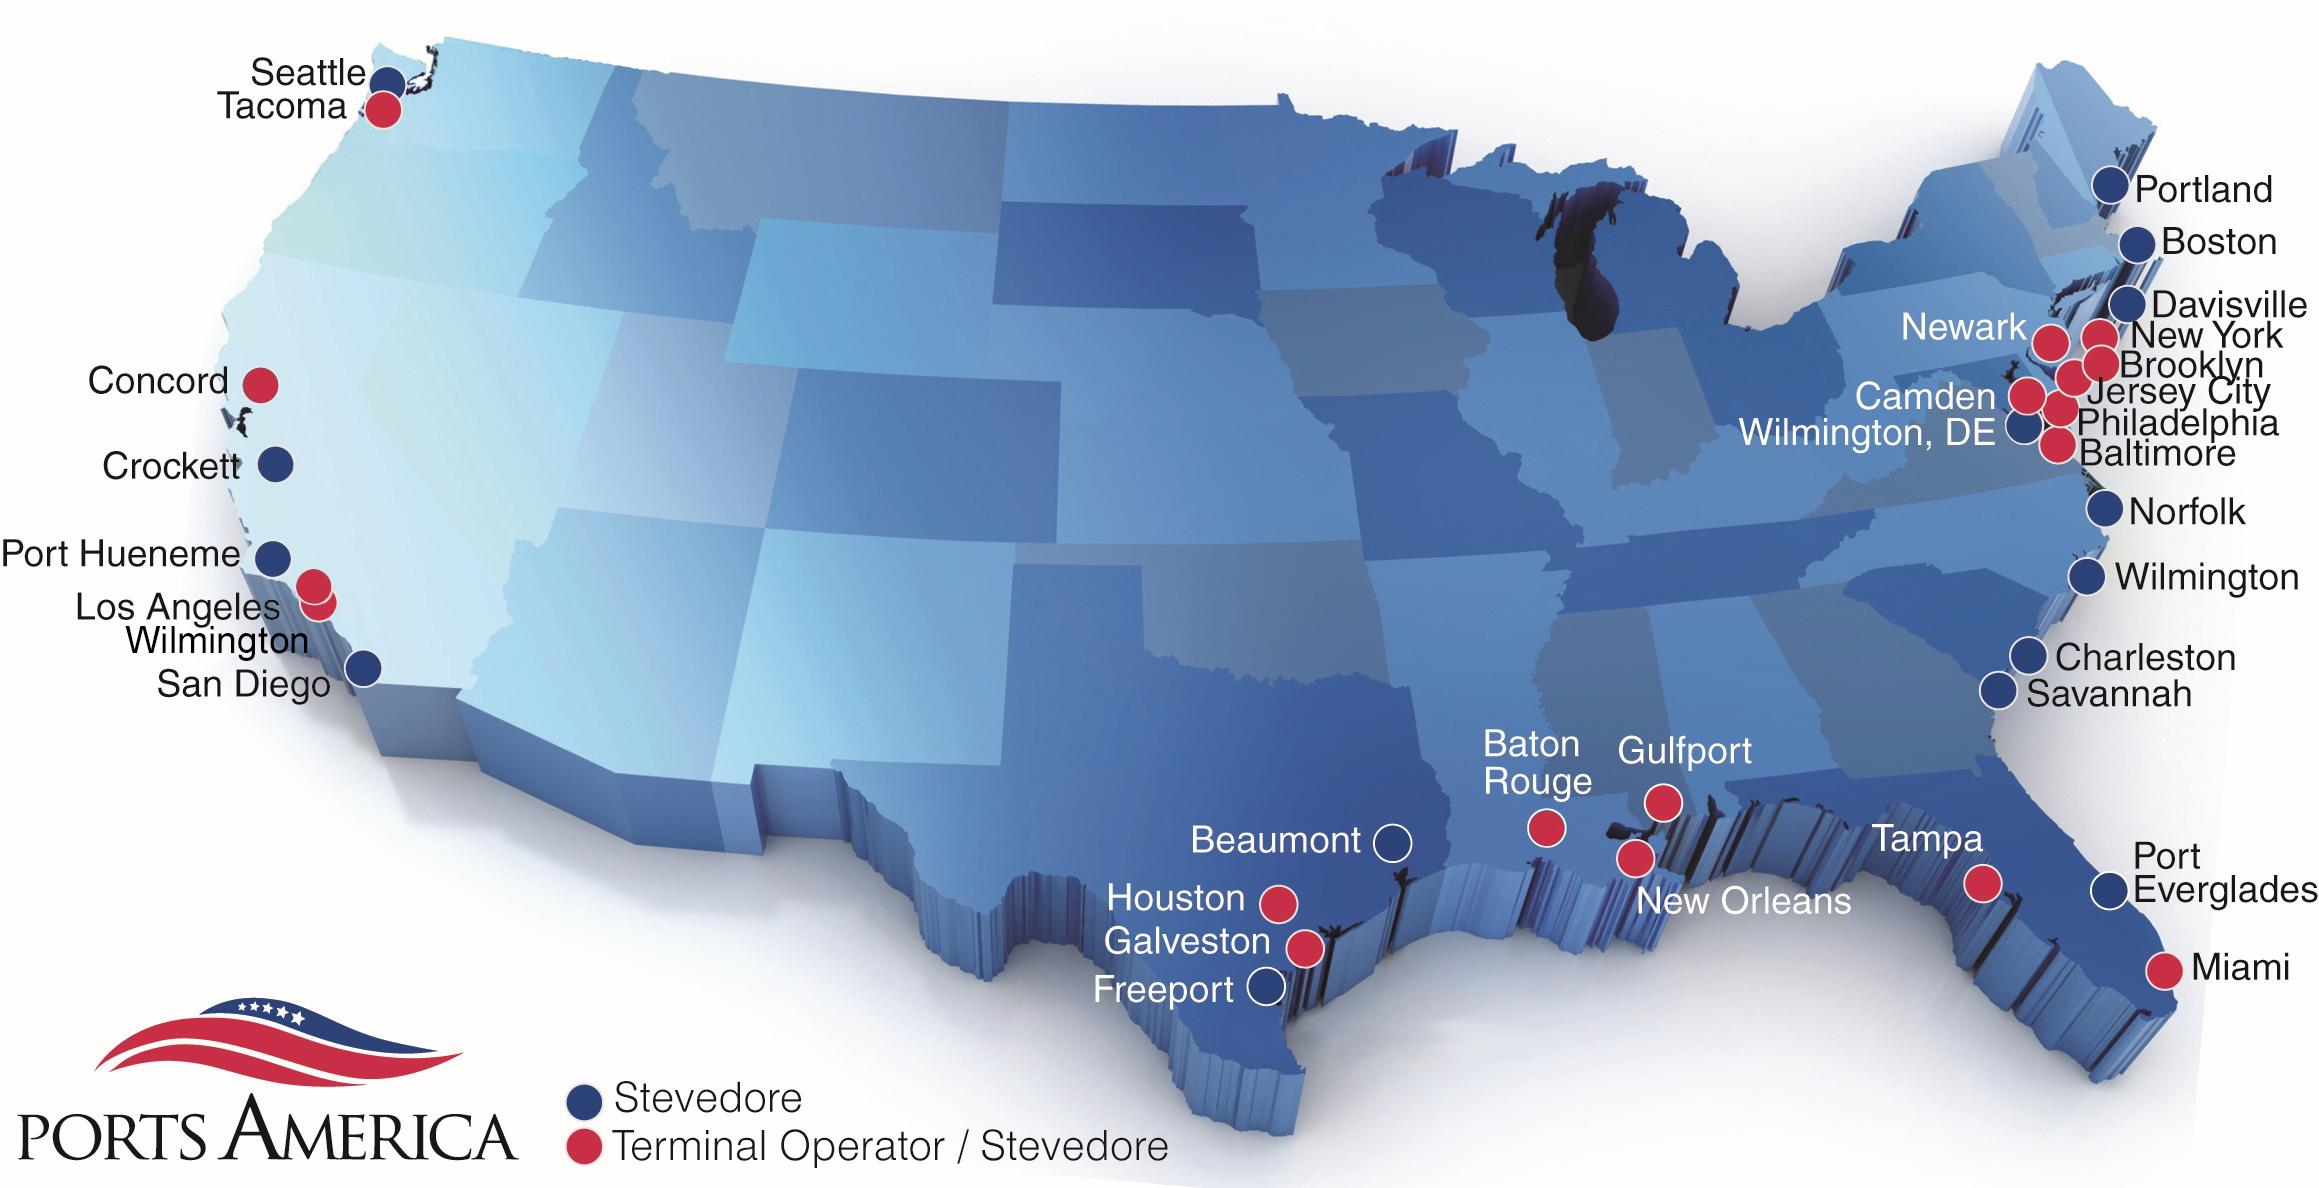 Terminal Operator And Stevedore Ports America - Us-east-coast-ports-map